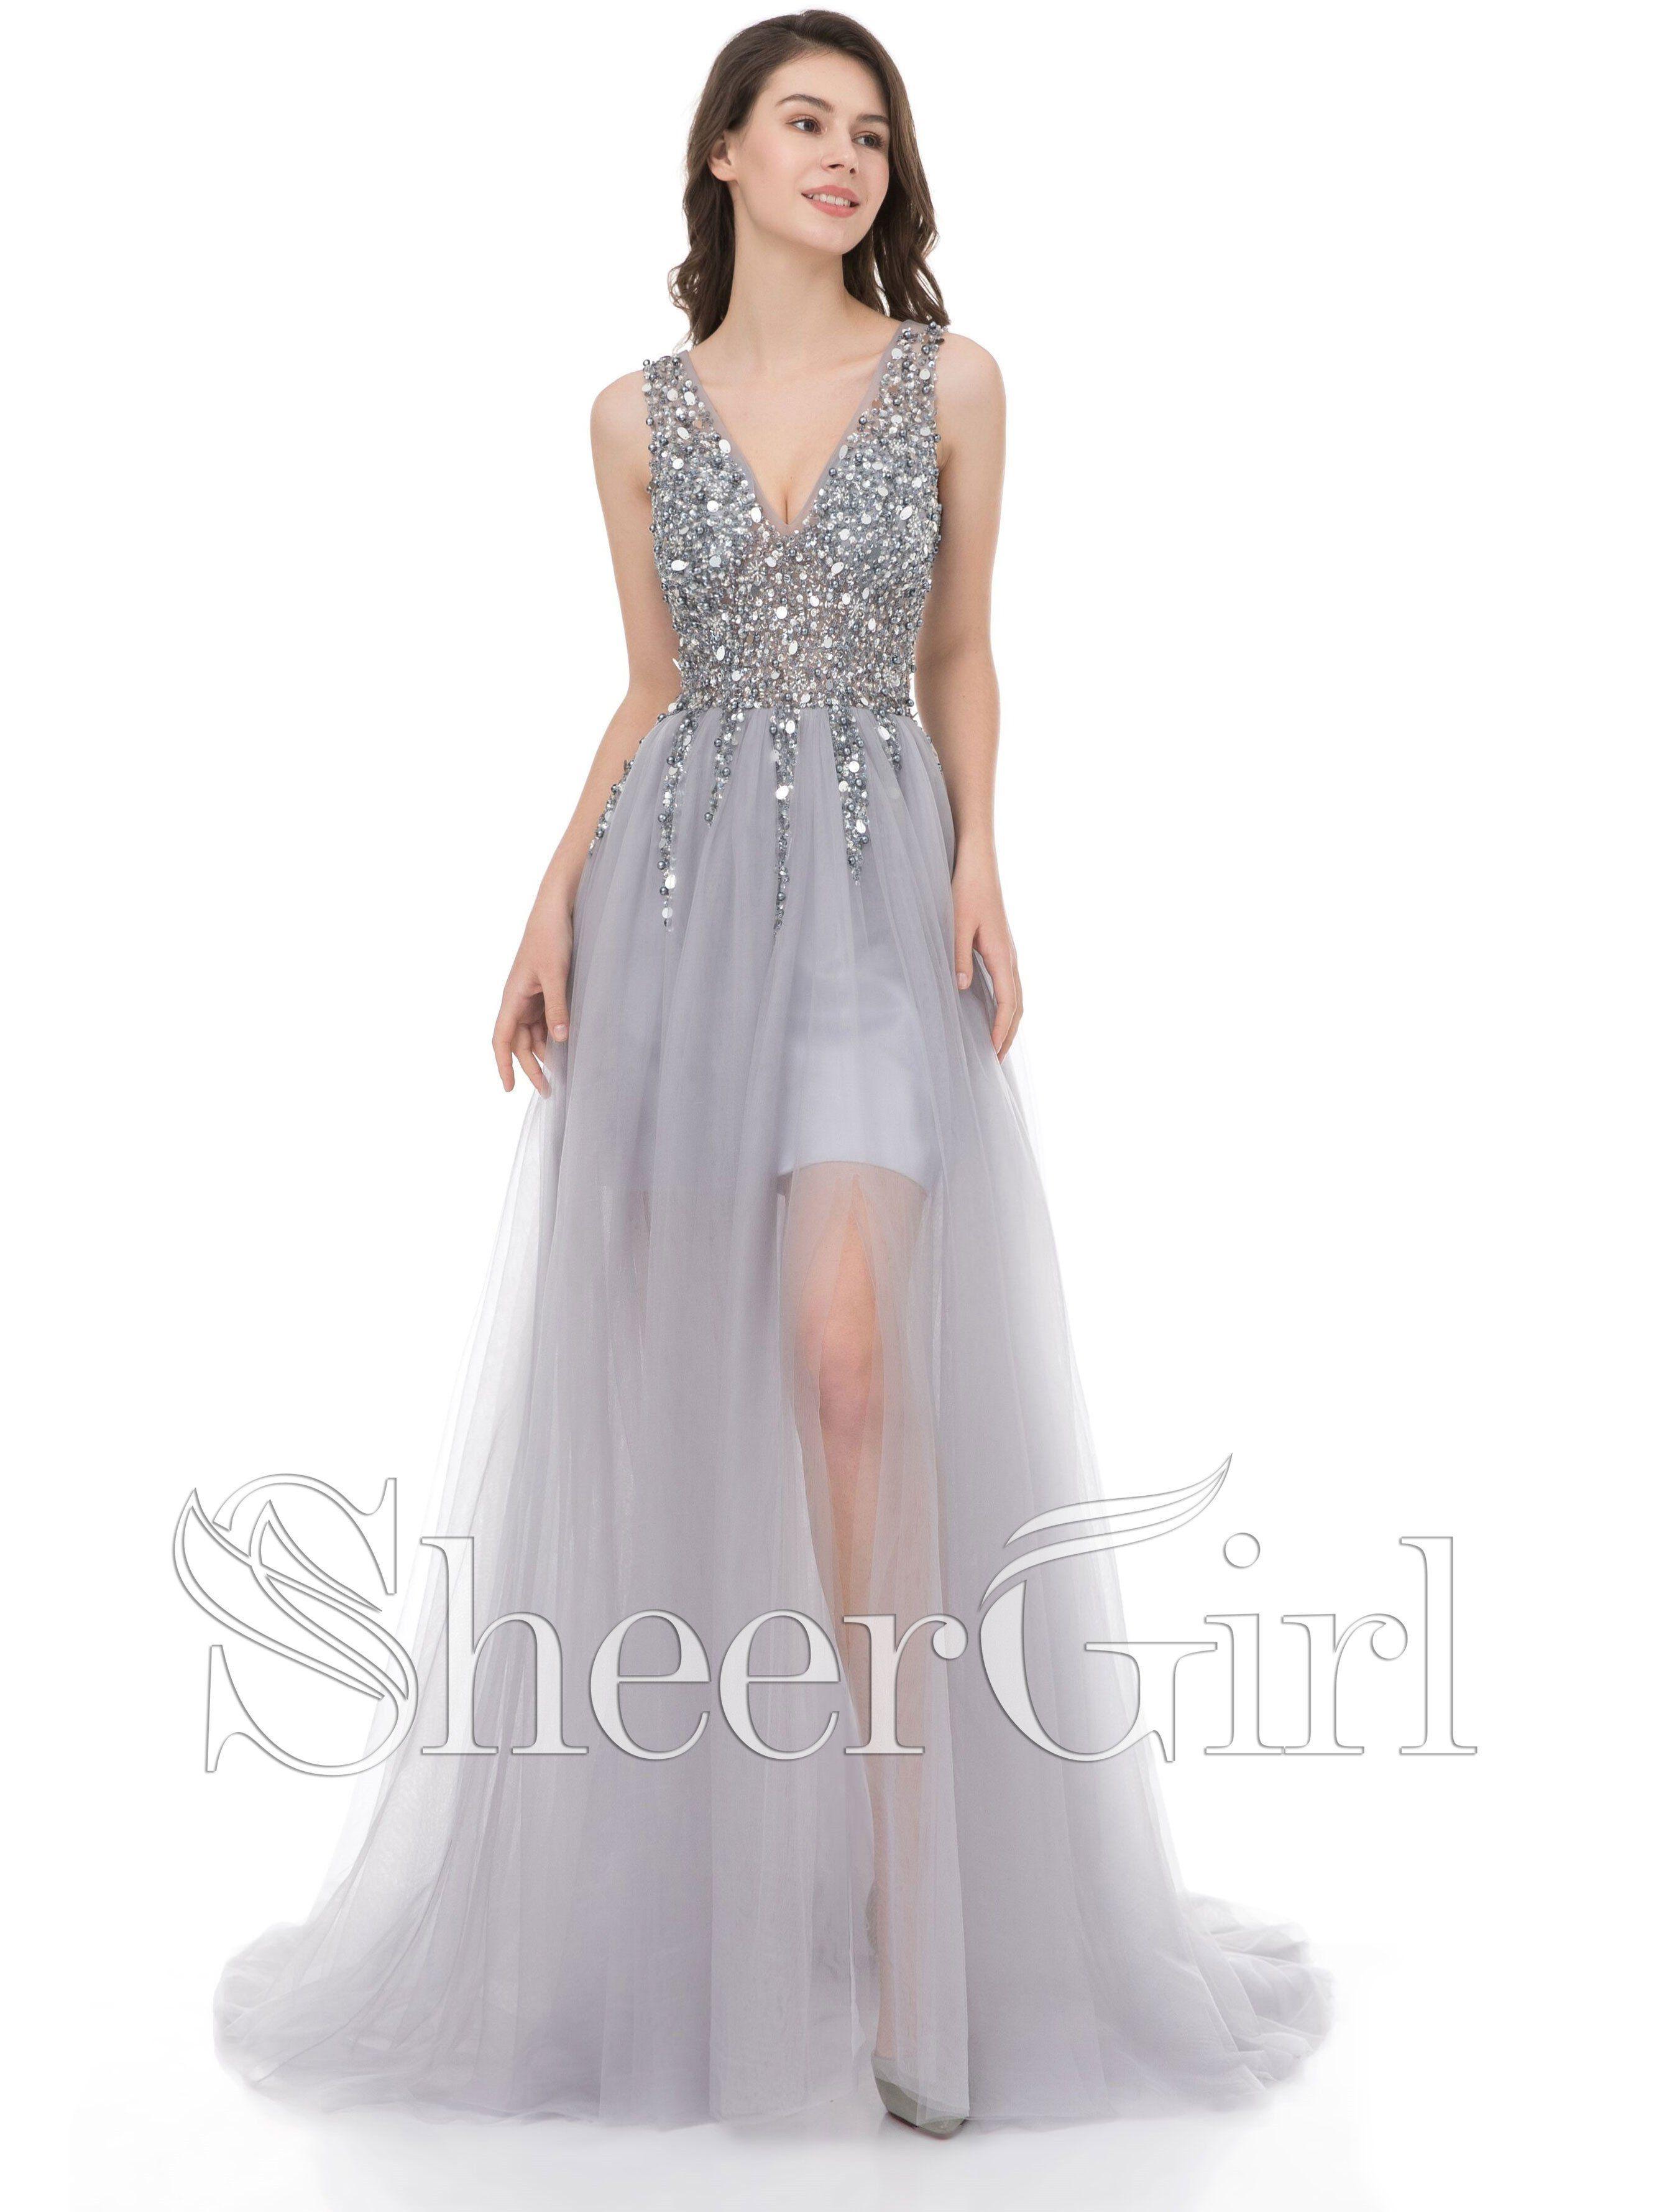 a5099e8b7cb6 A-line V-neck Beaded Tulle Long Prom Dresses Burgundy Prom Dress ...